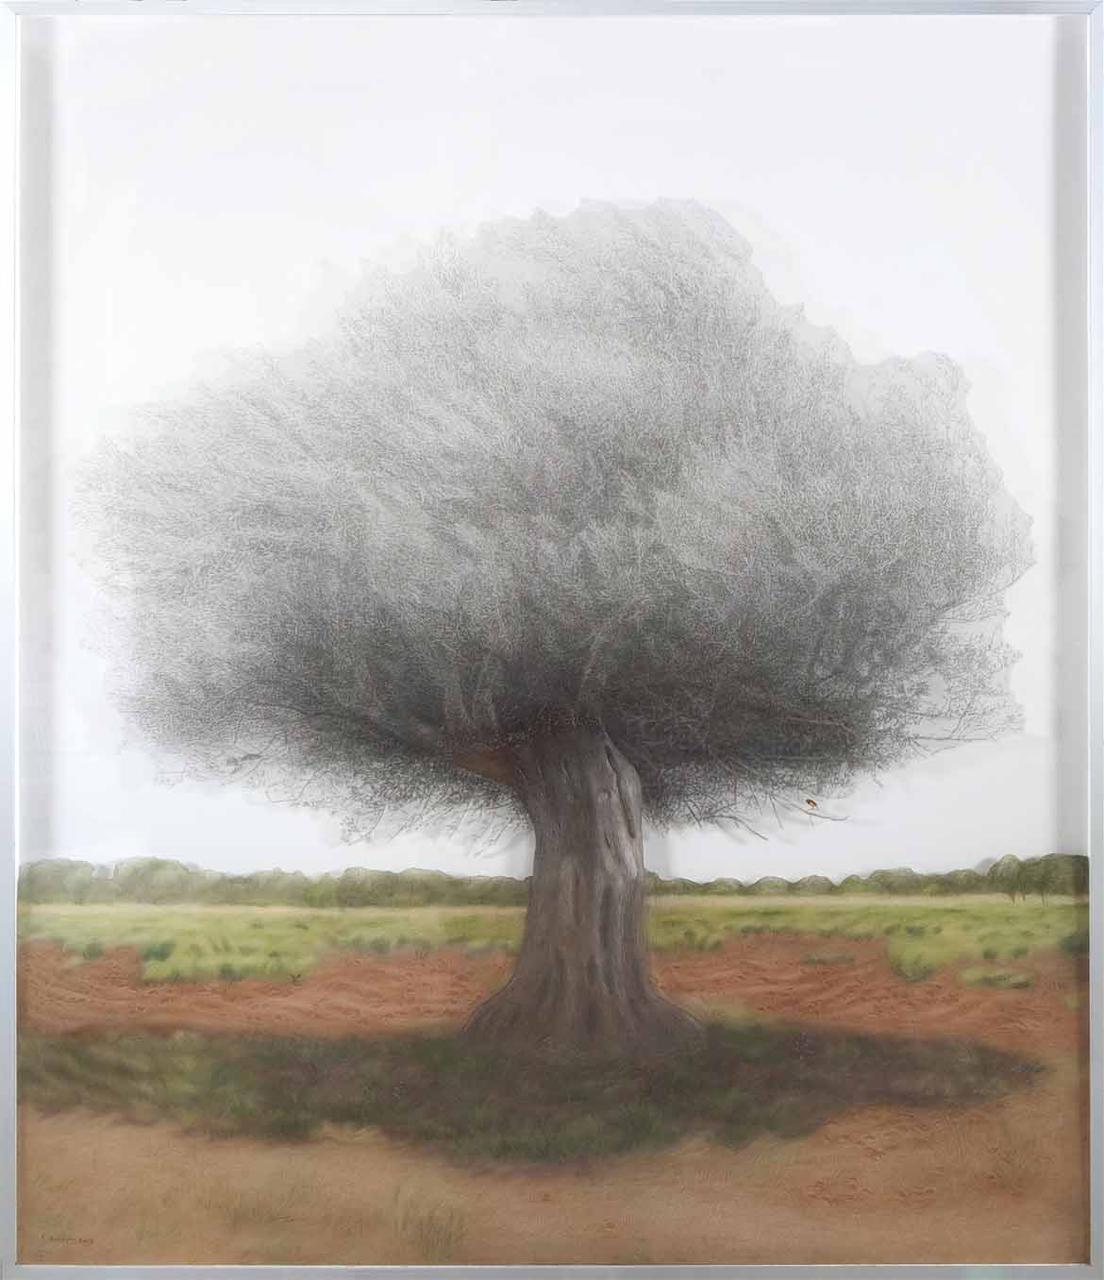 Olive Tree2, plexiglass dust and charcoal on transparent film, 169 x 200 cm, 2015